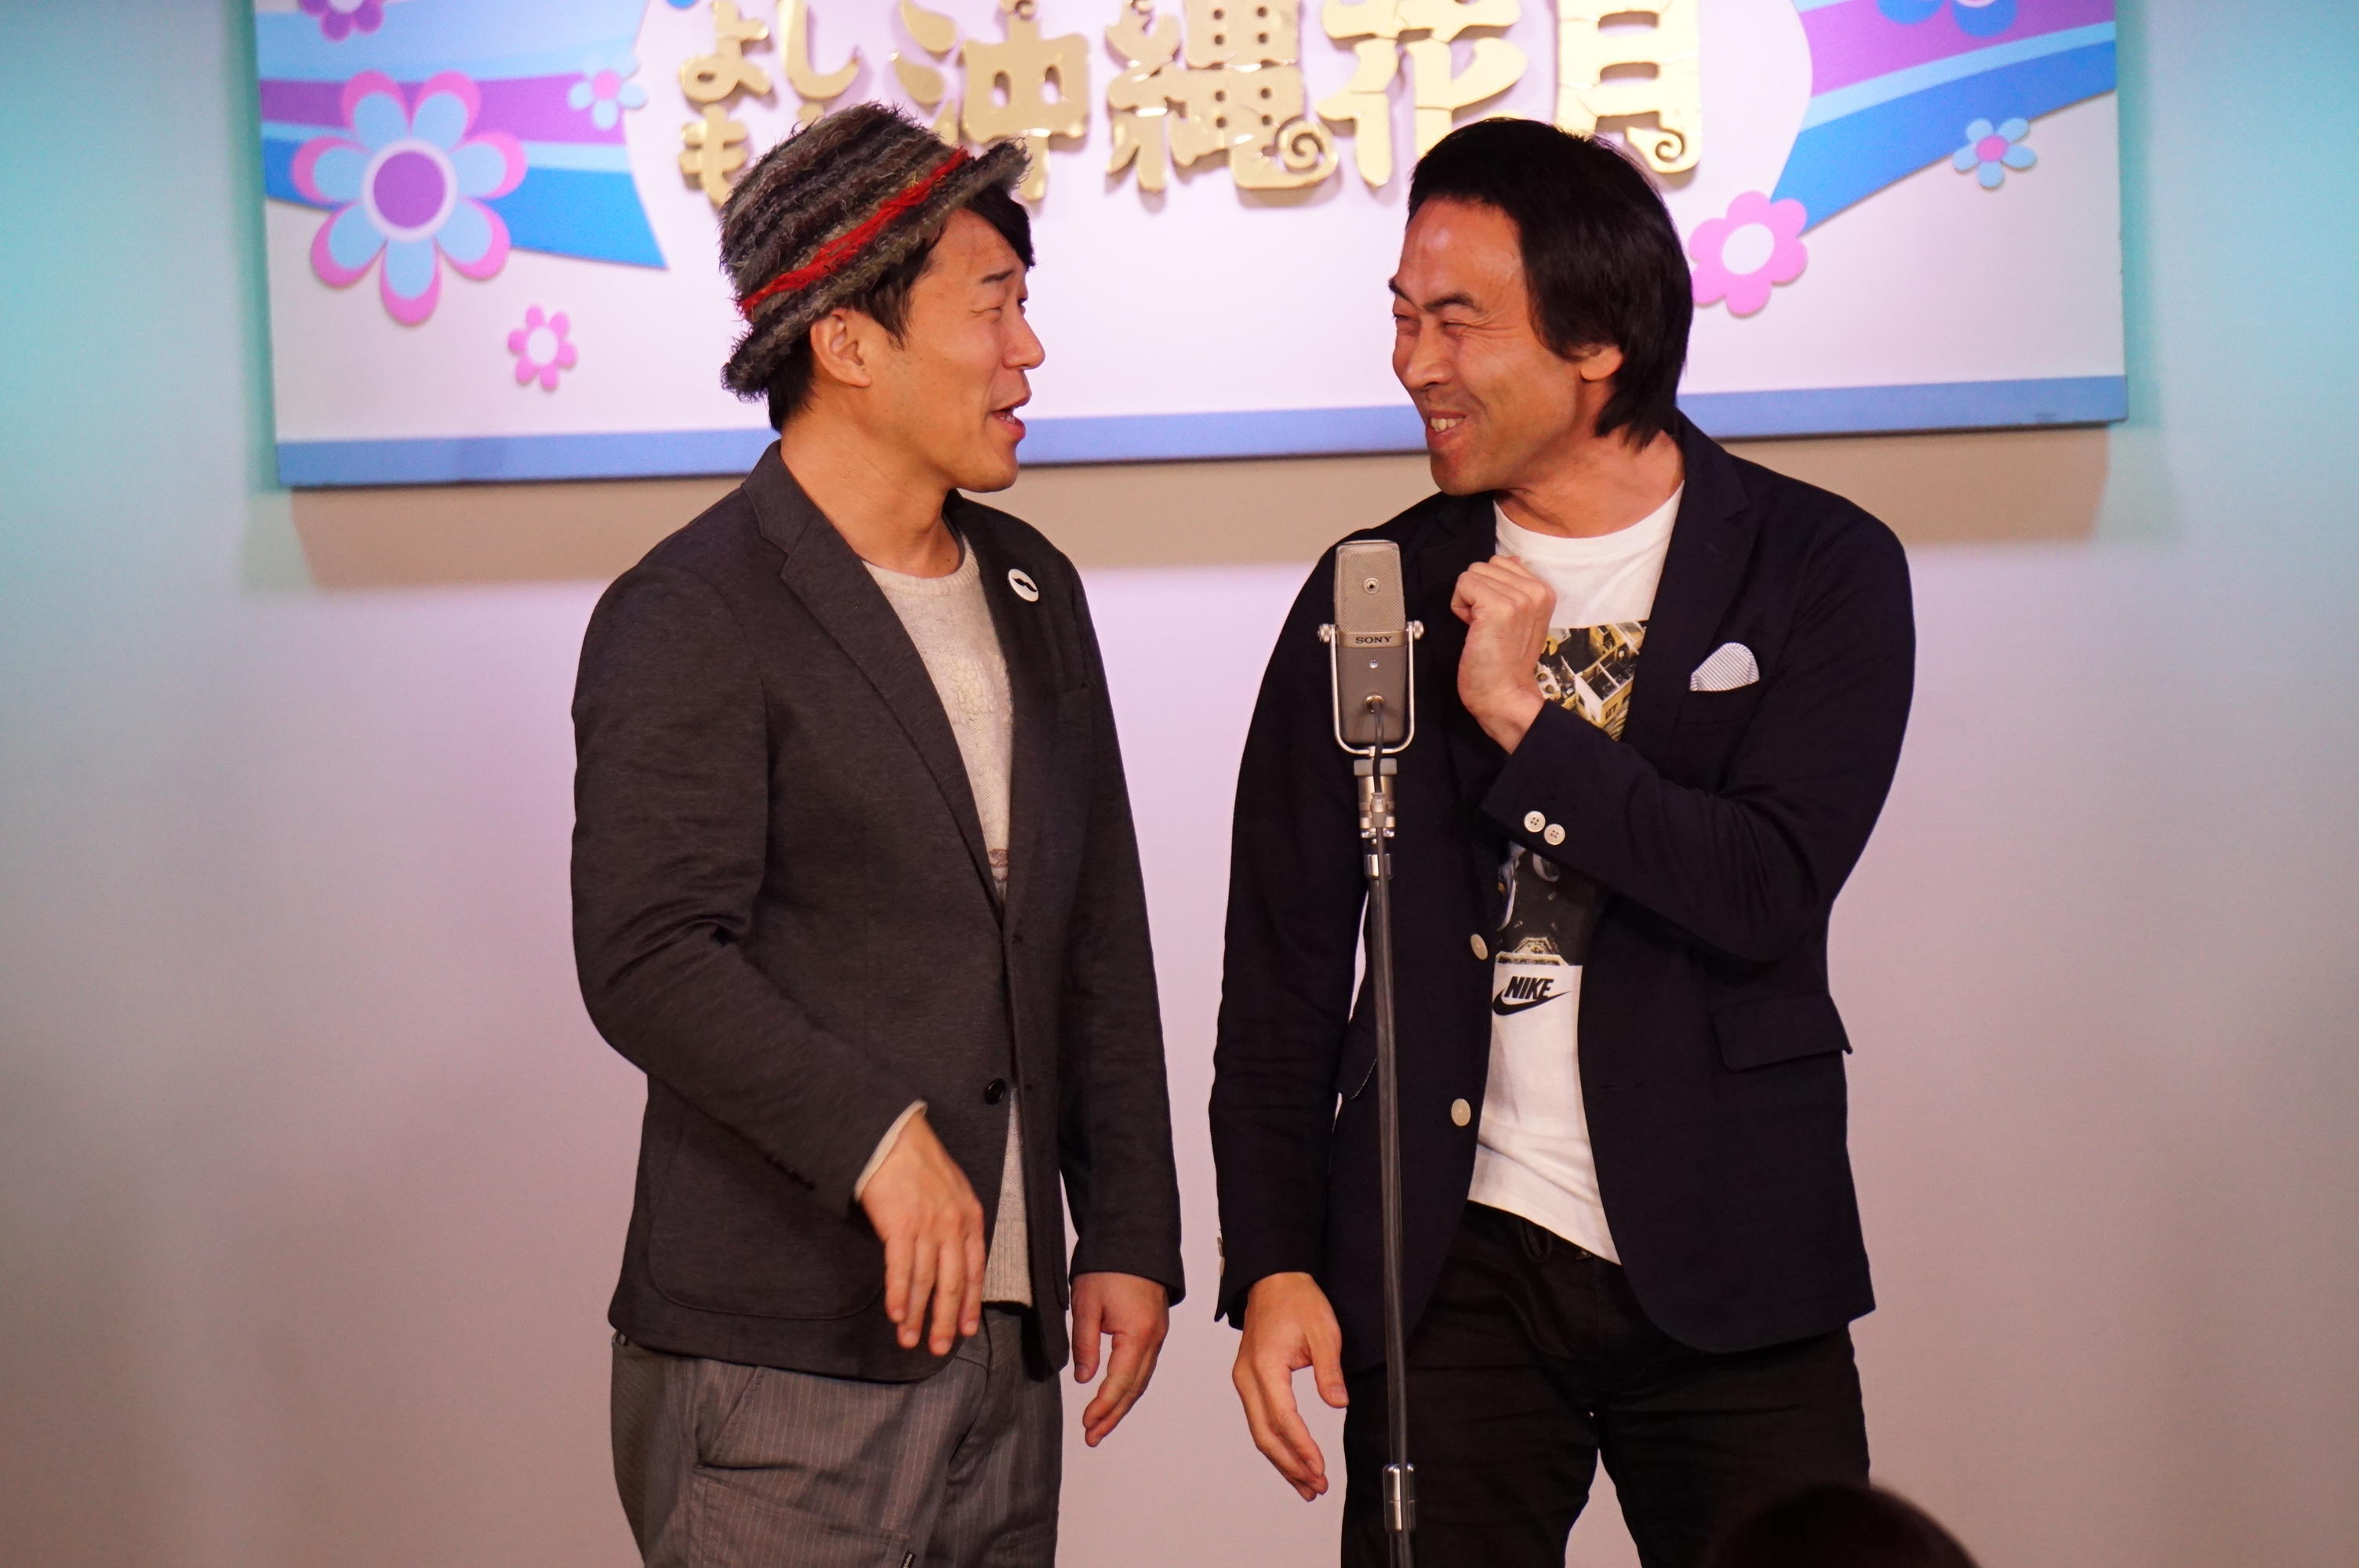 http://news.yoshimoto.co.jp/20180205141126-432ad59b3cb4f88630f460b73559392a3635b742.jpg